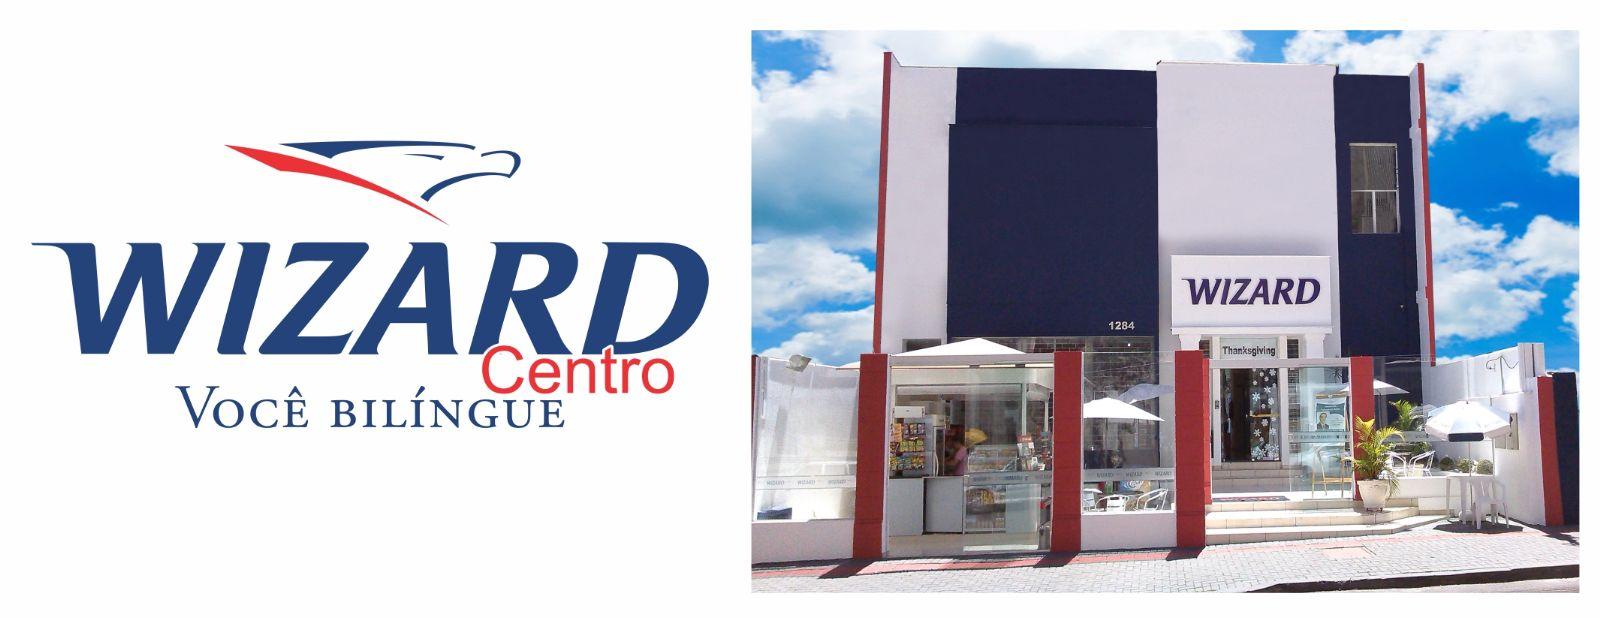 Wizard (Centro)